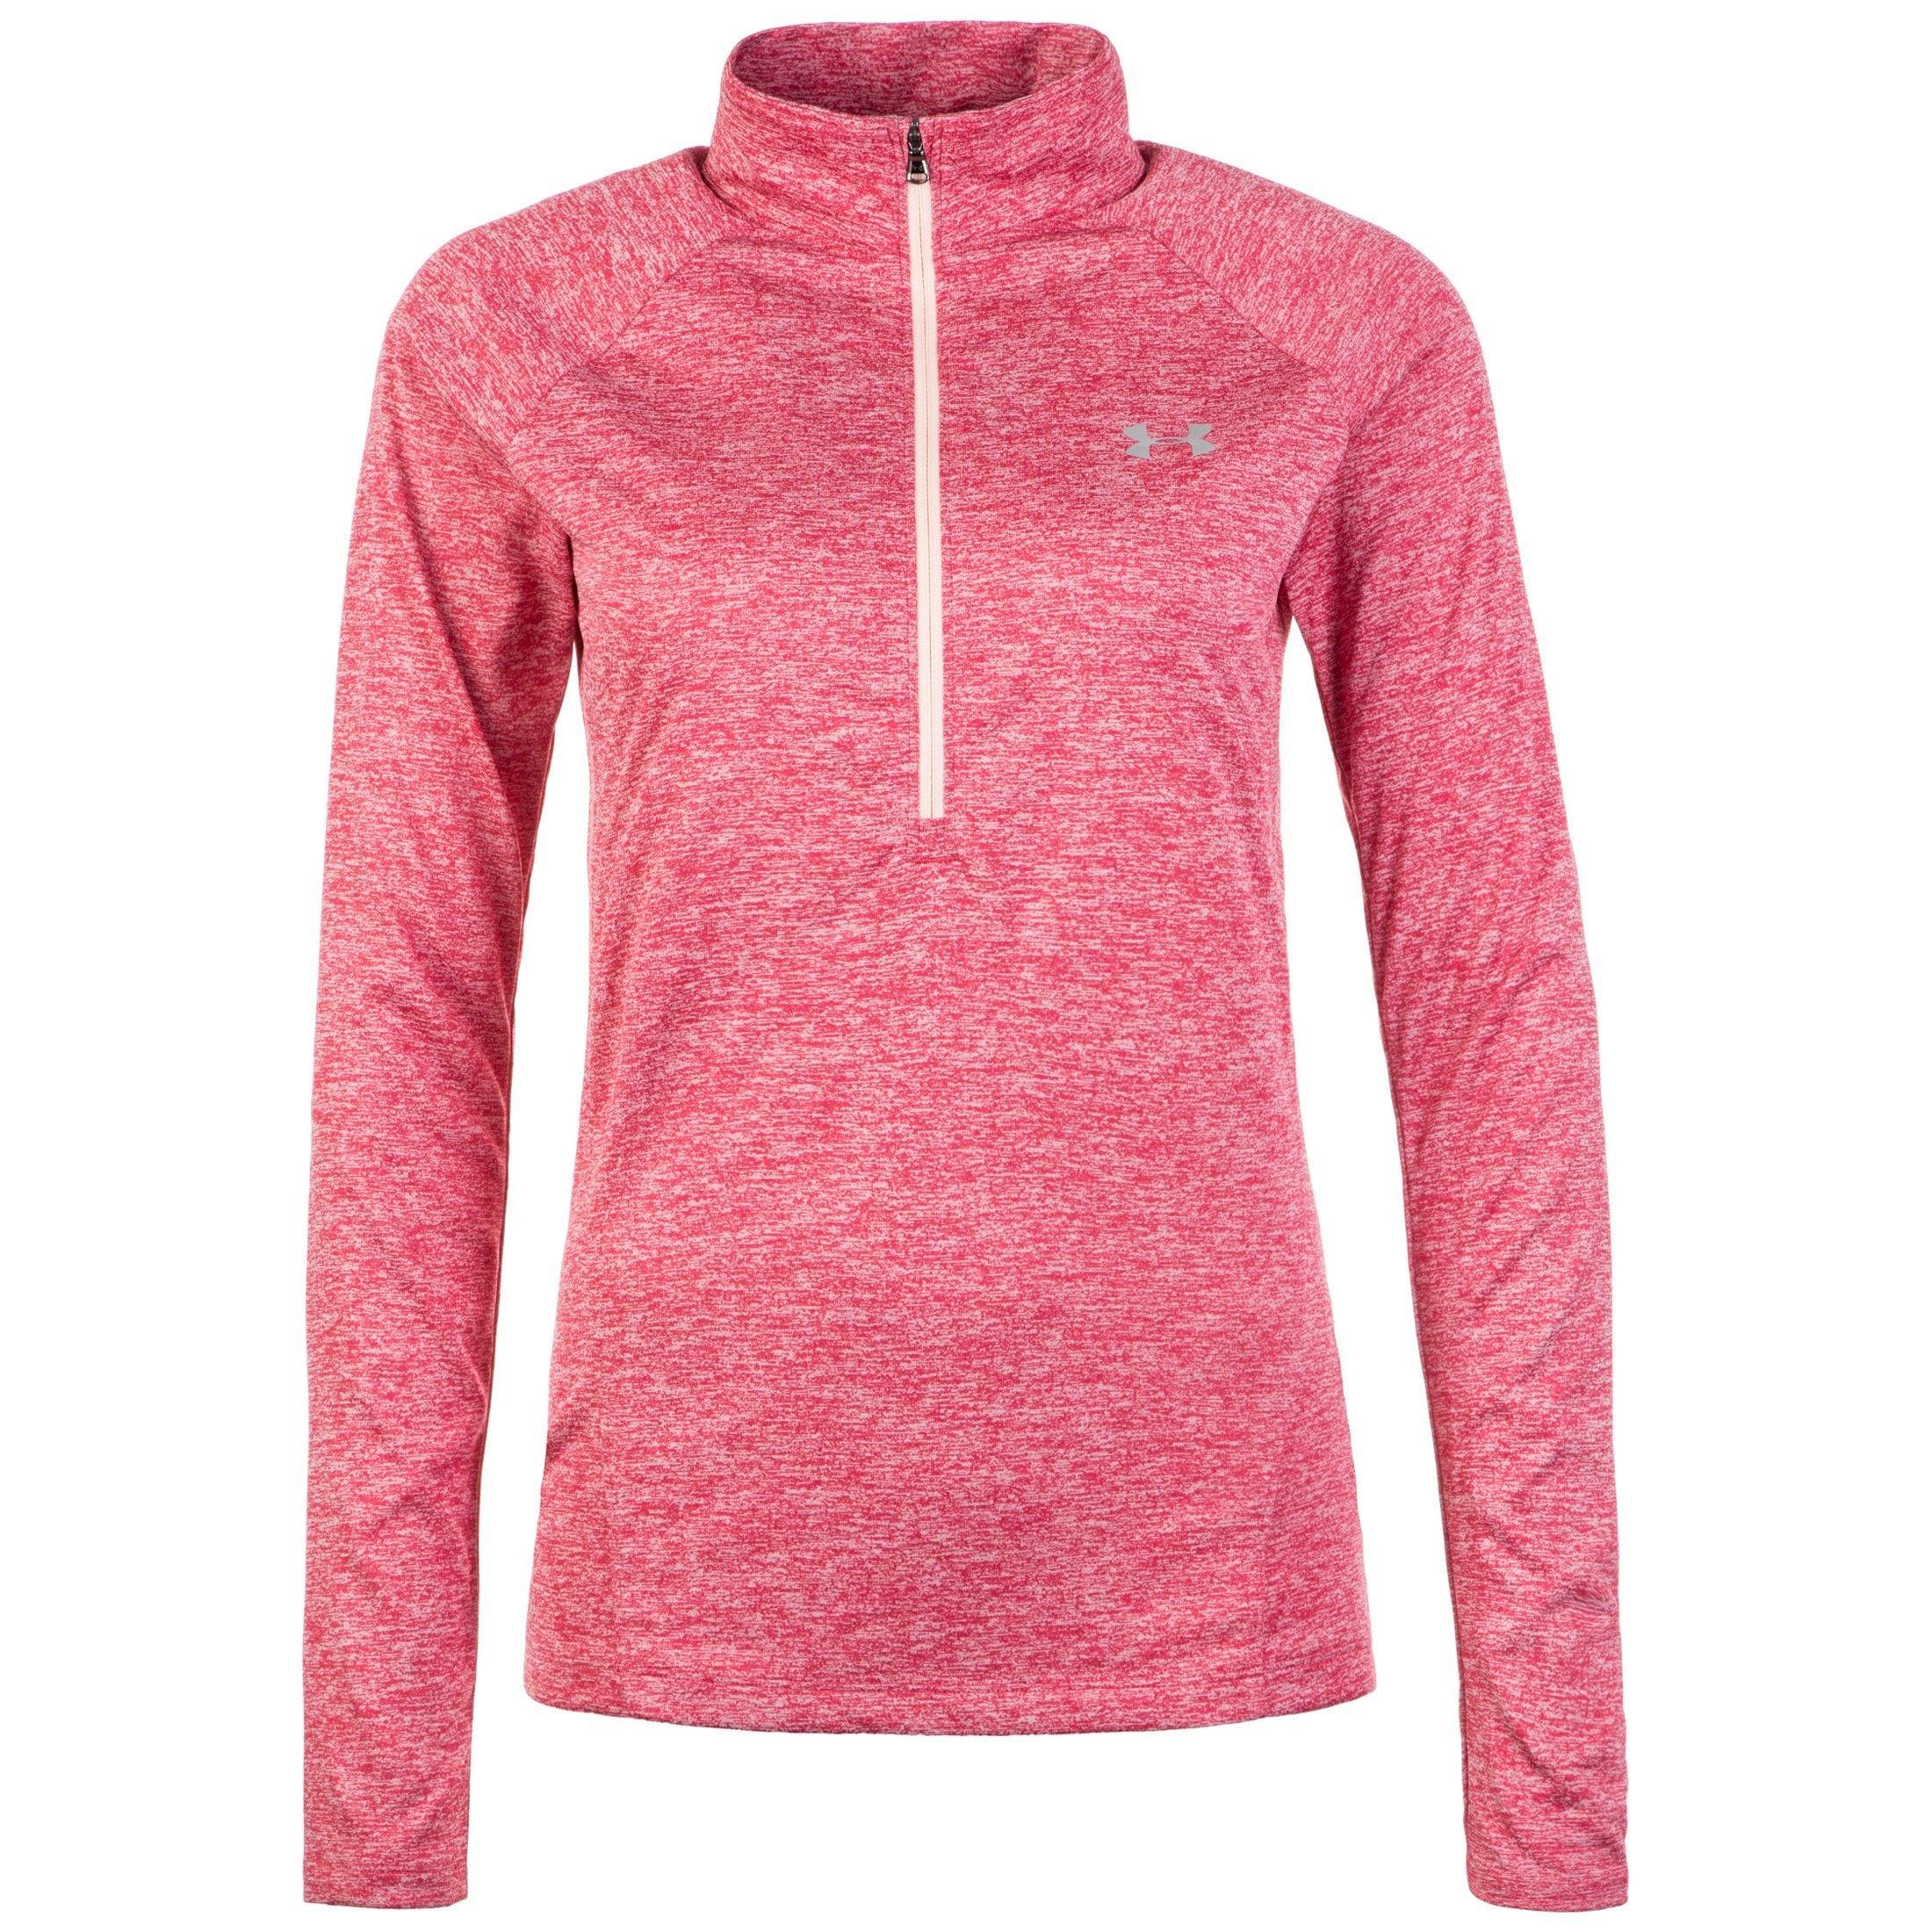 Under Armour Trainingsshirt Heatgear Tech Twist | Sportbekleidung > Sportshirts > Funktionsshirts | Rosa | Under Armour